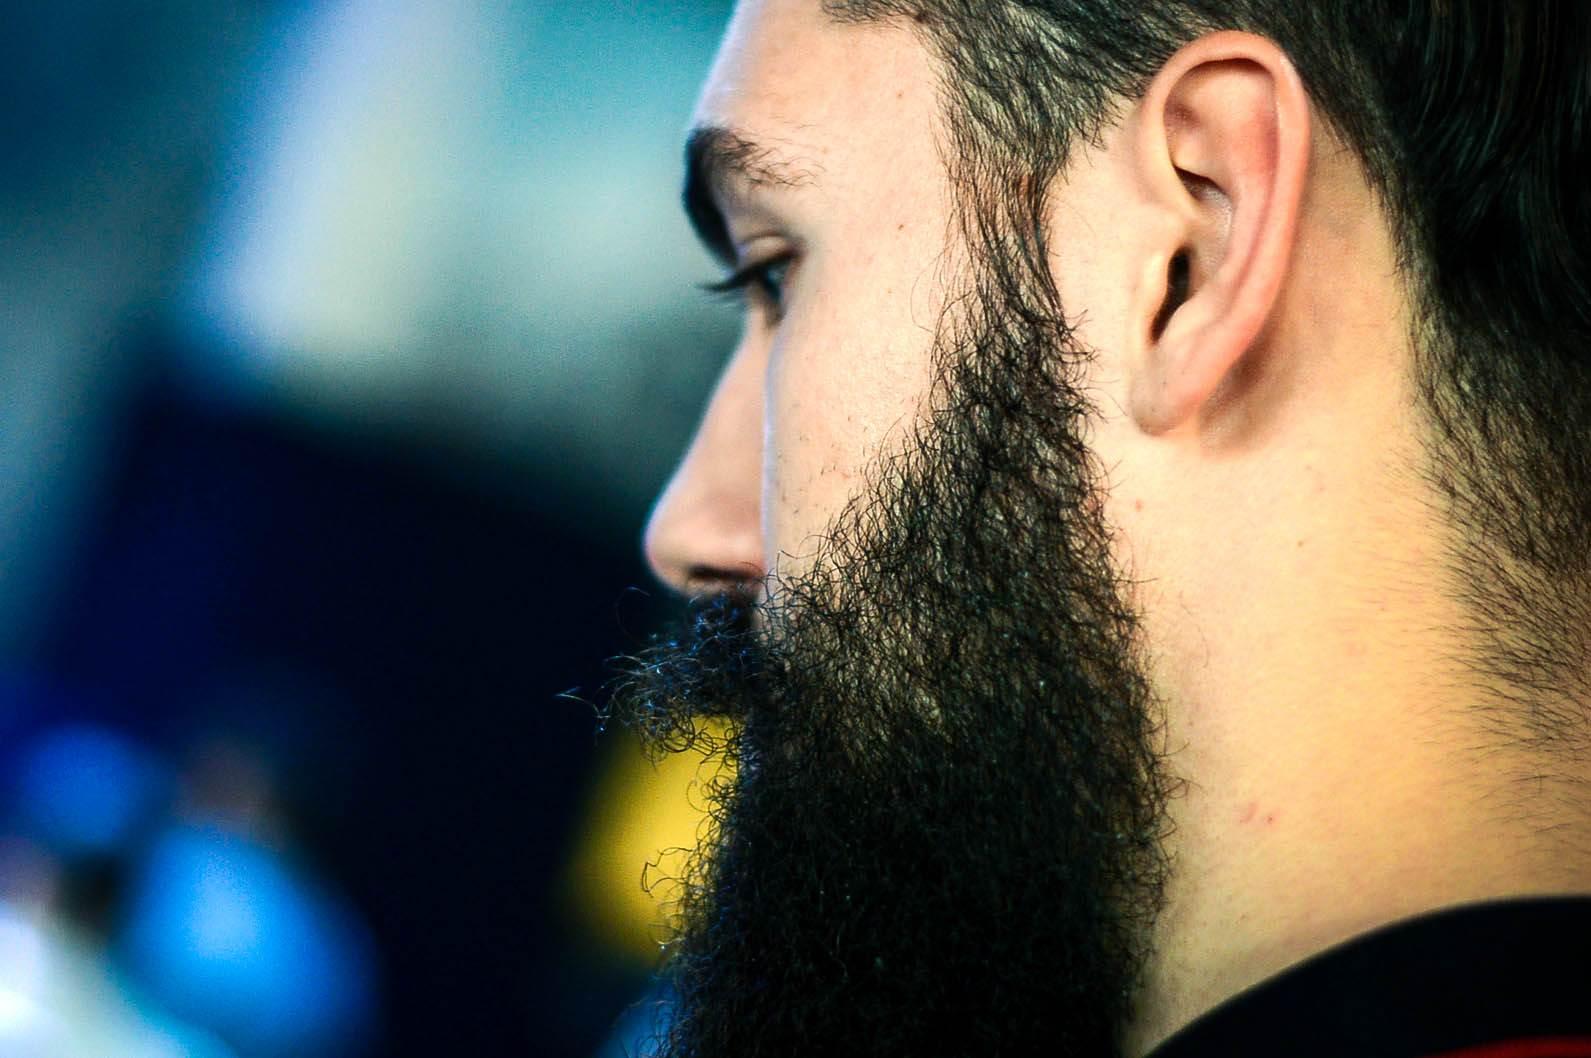 brada, brkovi, brada i brkovi, bradonja, bradonj4e, najlepša brada u gradu, mikser haus, mikser house